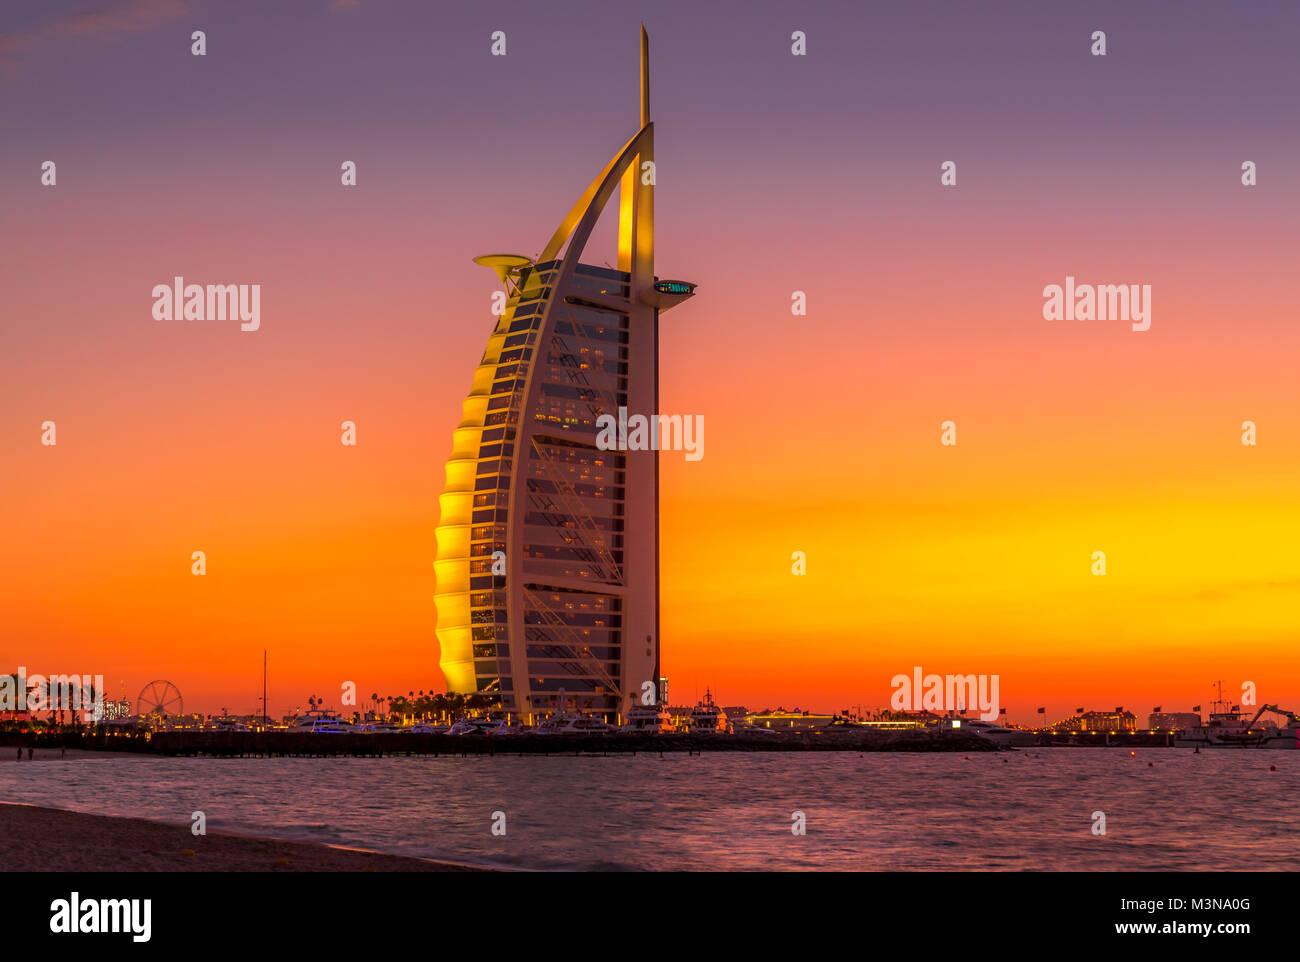 Sonnenuntergang Blick auf das Burj Al Arab Hotel am Jumeirah Beach in Dubai, Vereinigte Arabische Emirate Stockbild